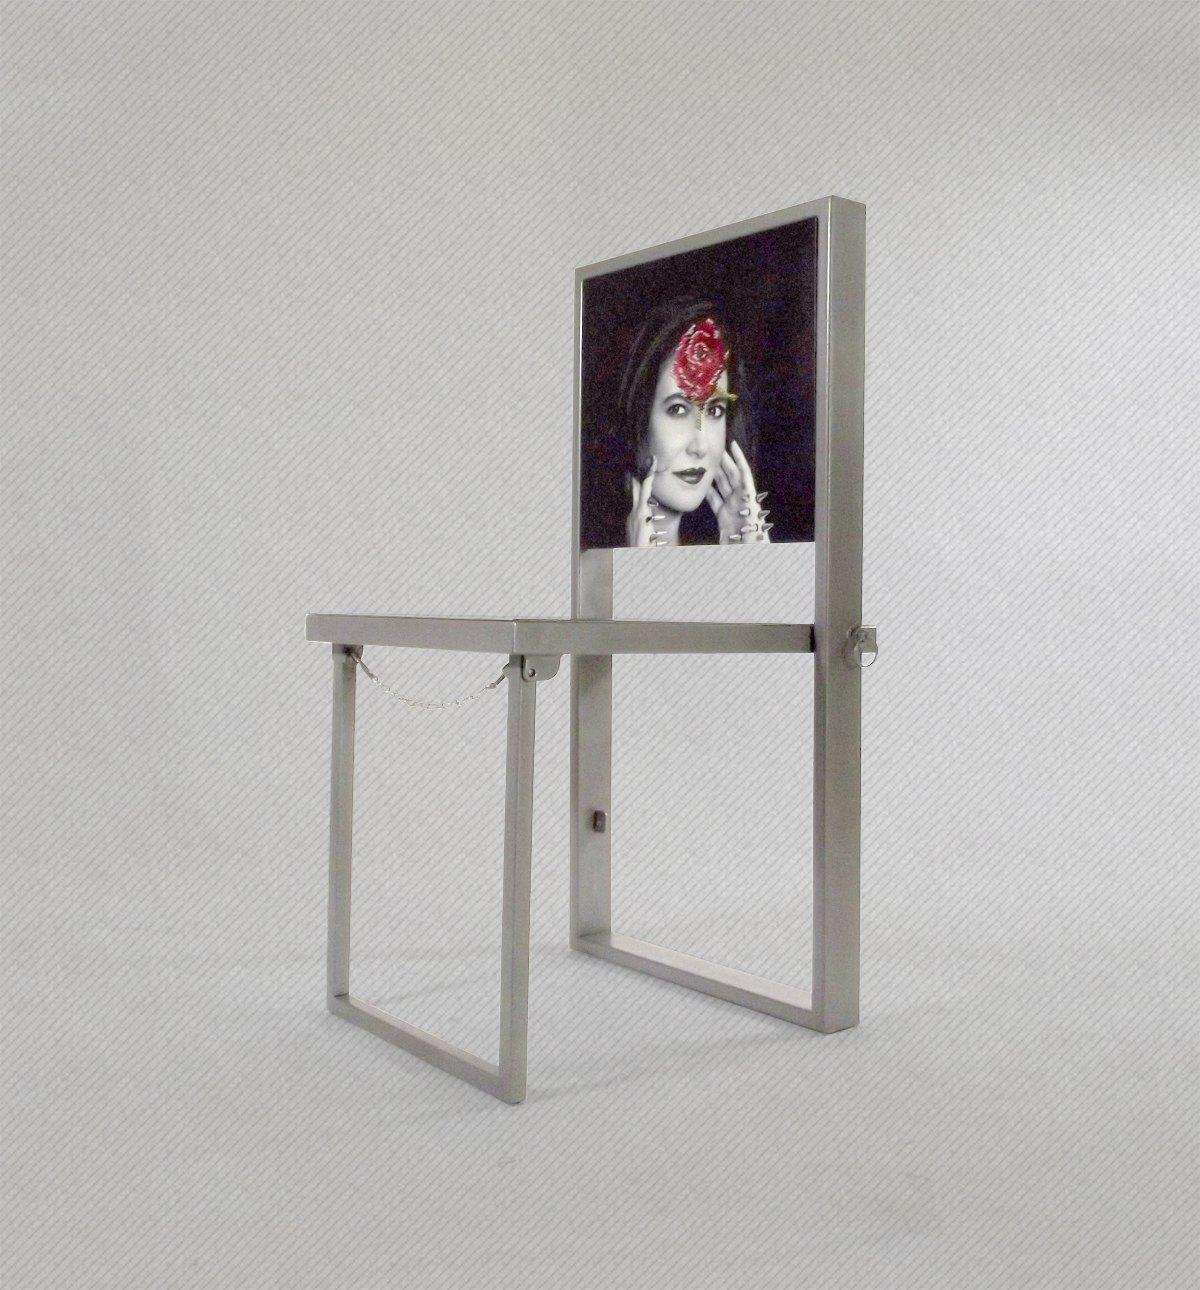 illusion-model-5-open